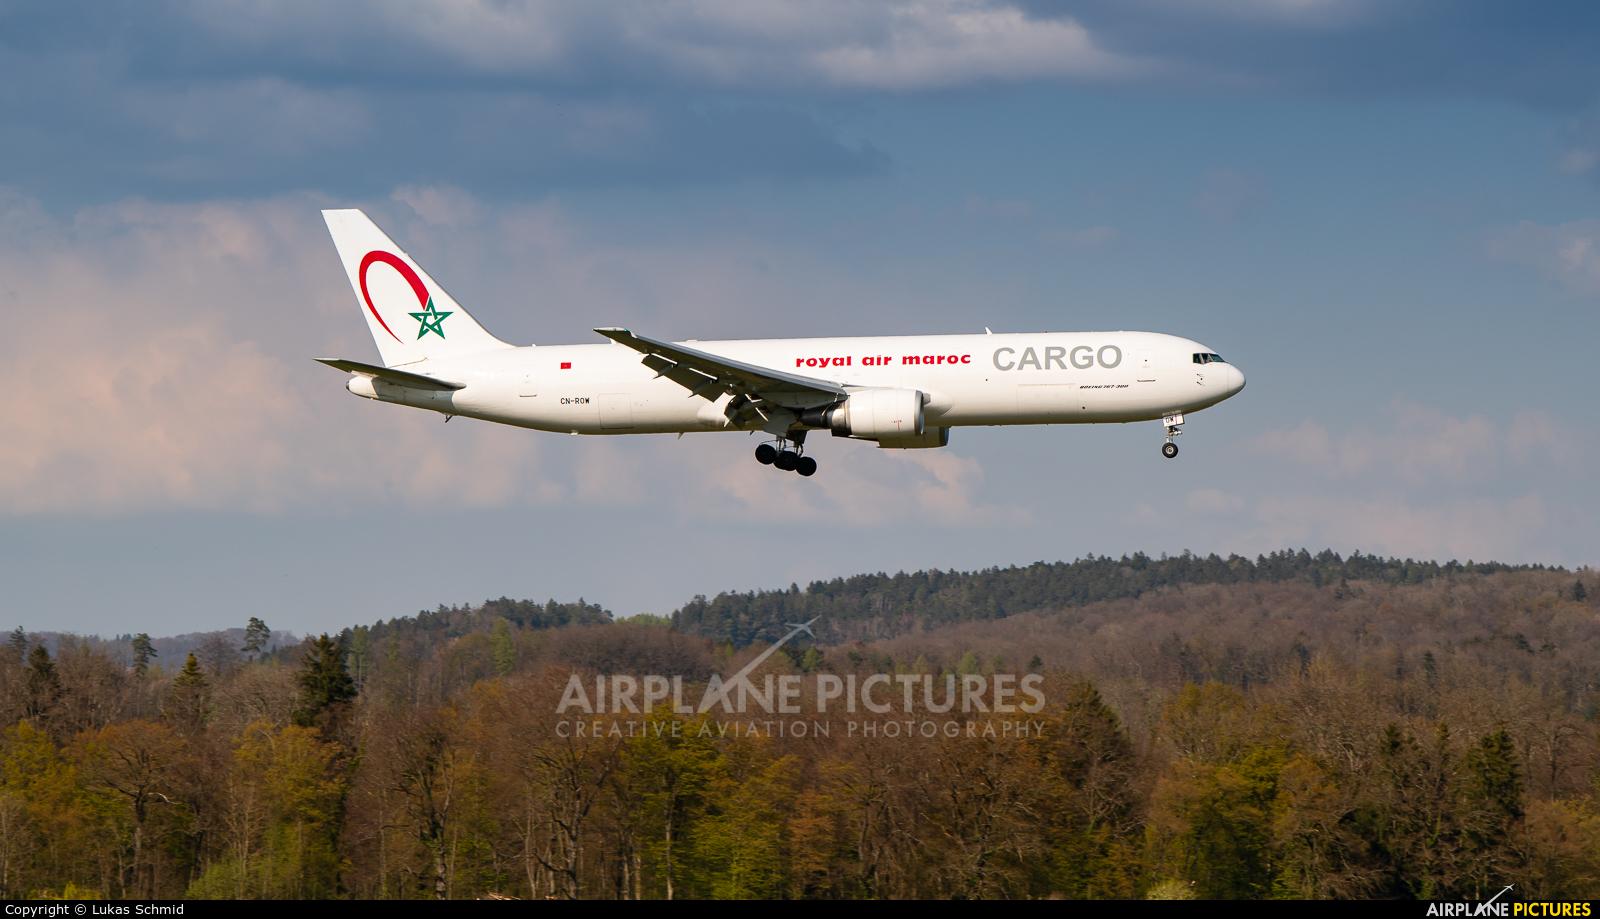 Royal Air Maroc Cargo CN-ROW aircraft at Zurich